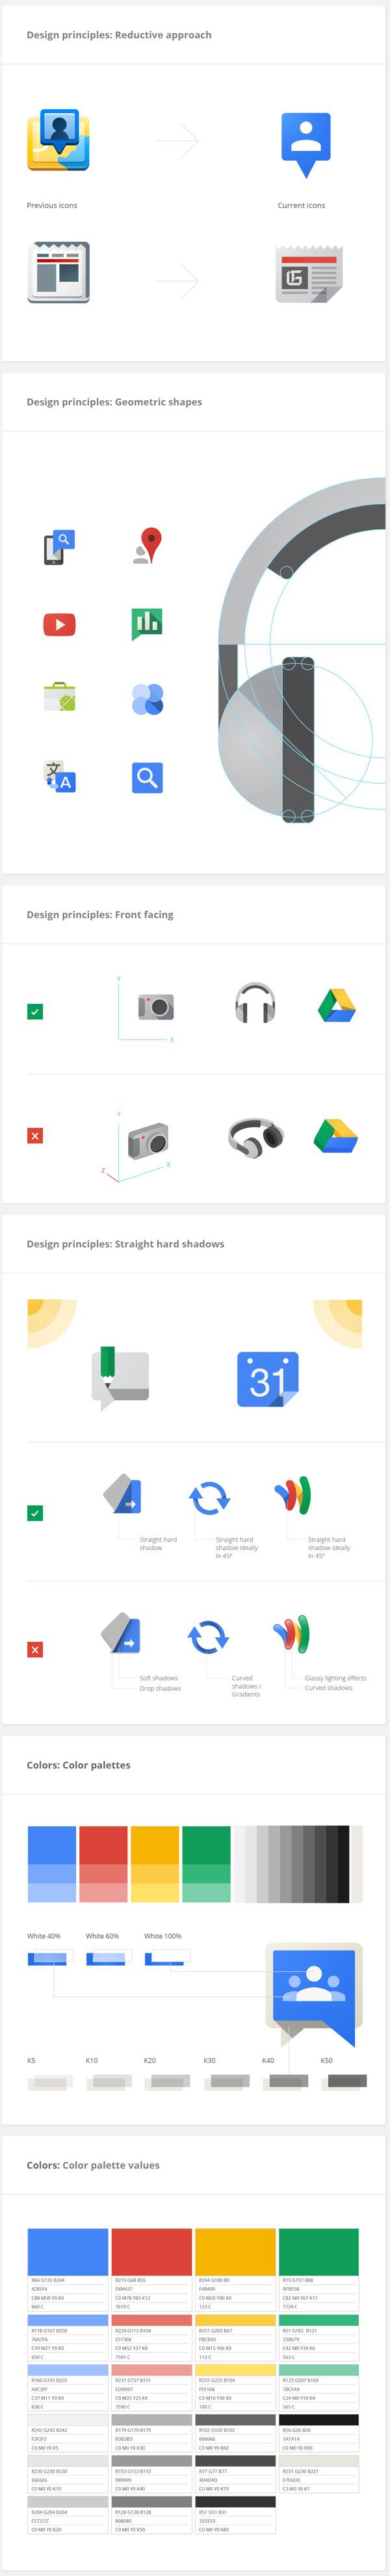 google visual guidelines ////  http://www.behance.net/gallery/Google-Visual-Assets-Guidelines-Part-1/9028077 //// http://www.behance.net/gallery/Google-Visual-Assets-Guidelines-Part-2/9084309